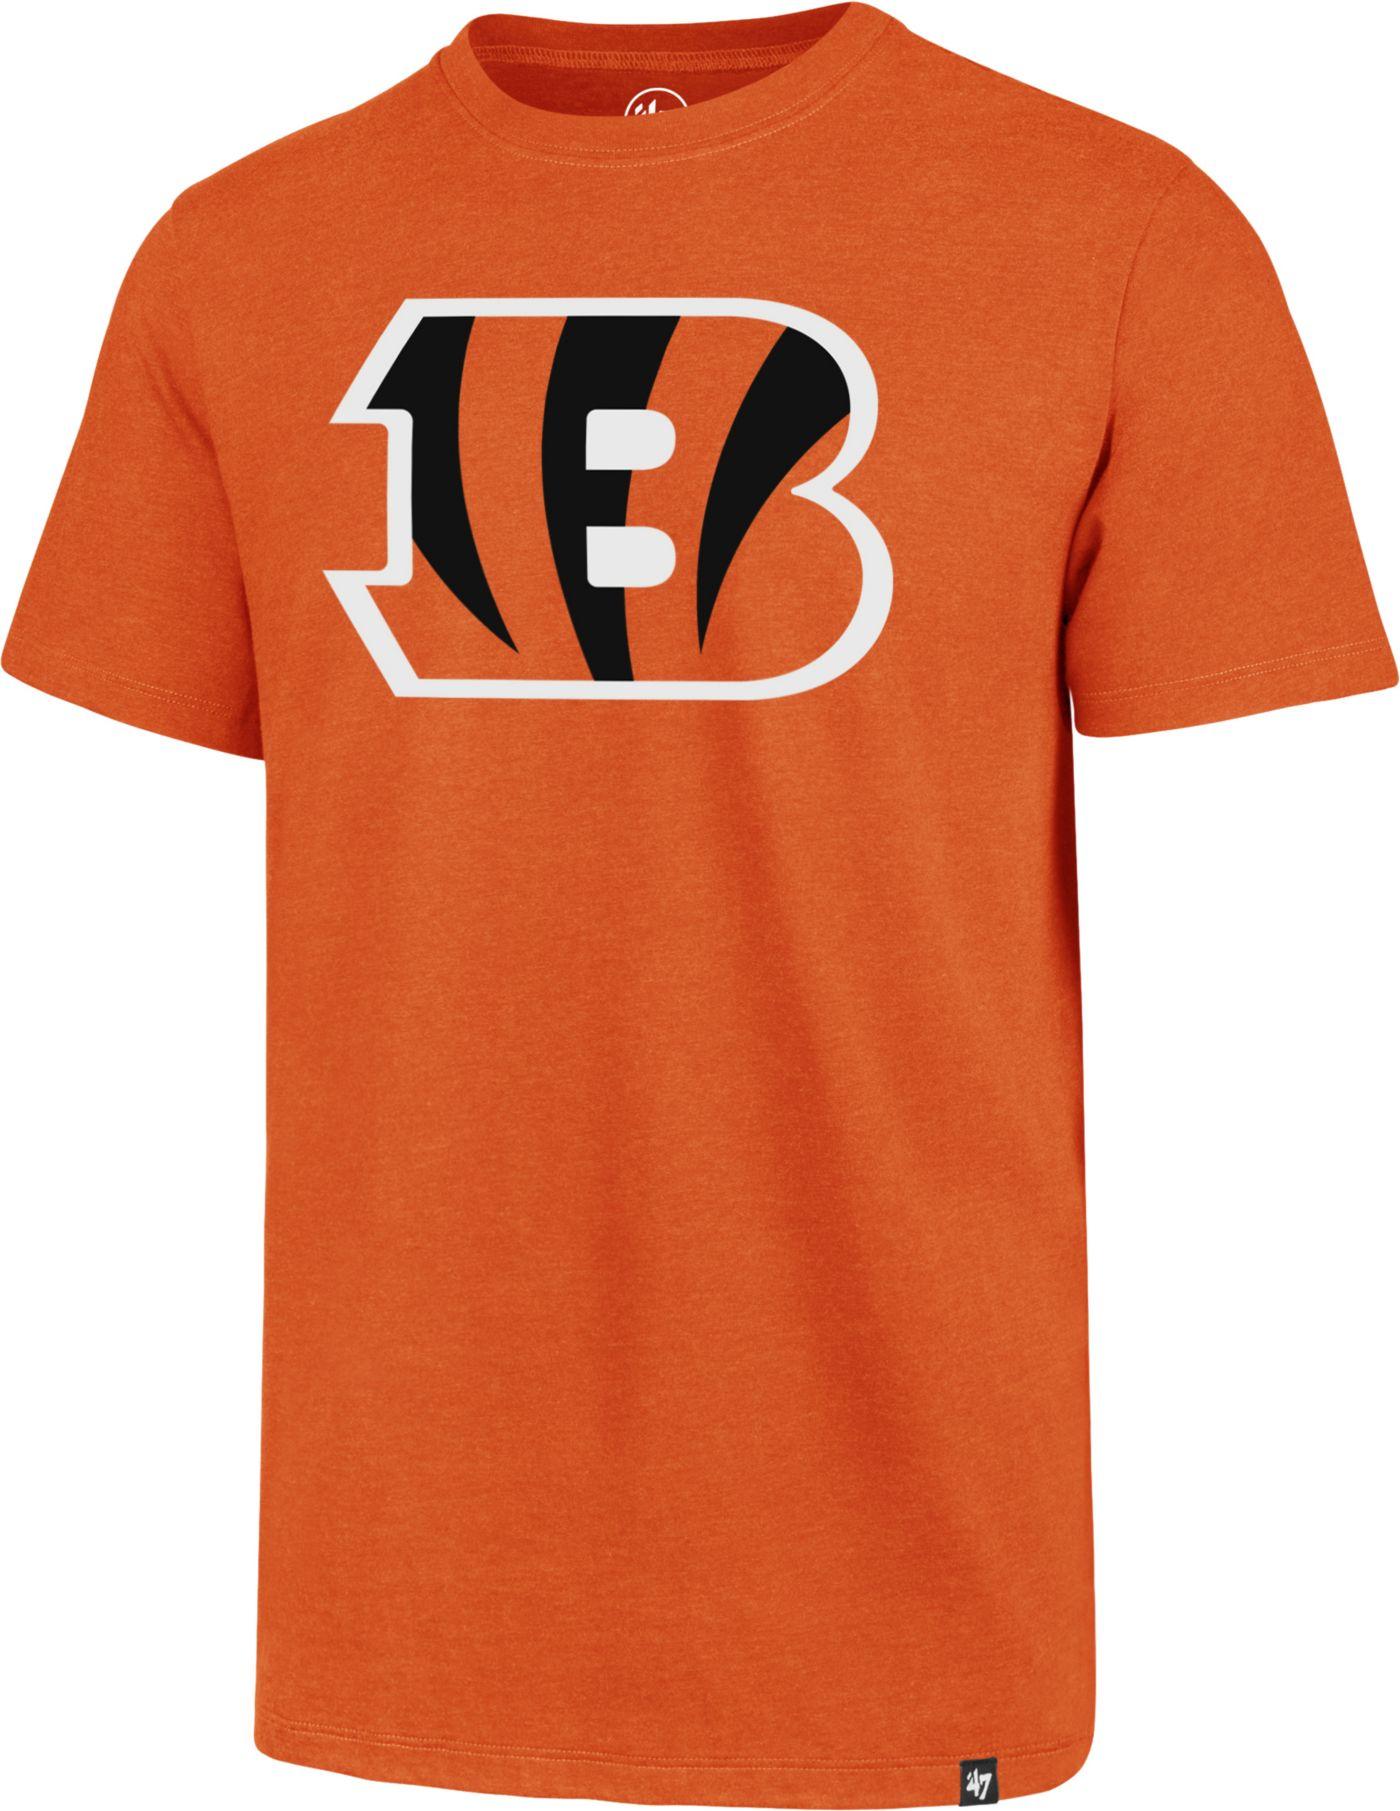 '47 Men's Cincinnati Bengals Imprint Club Orange T-Shirt